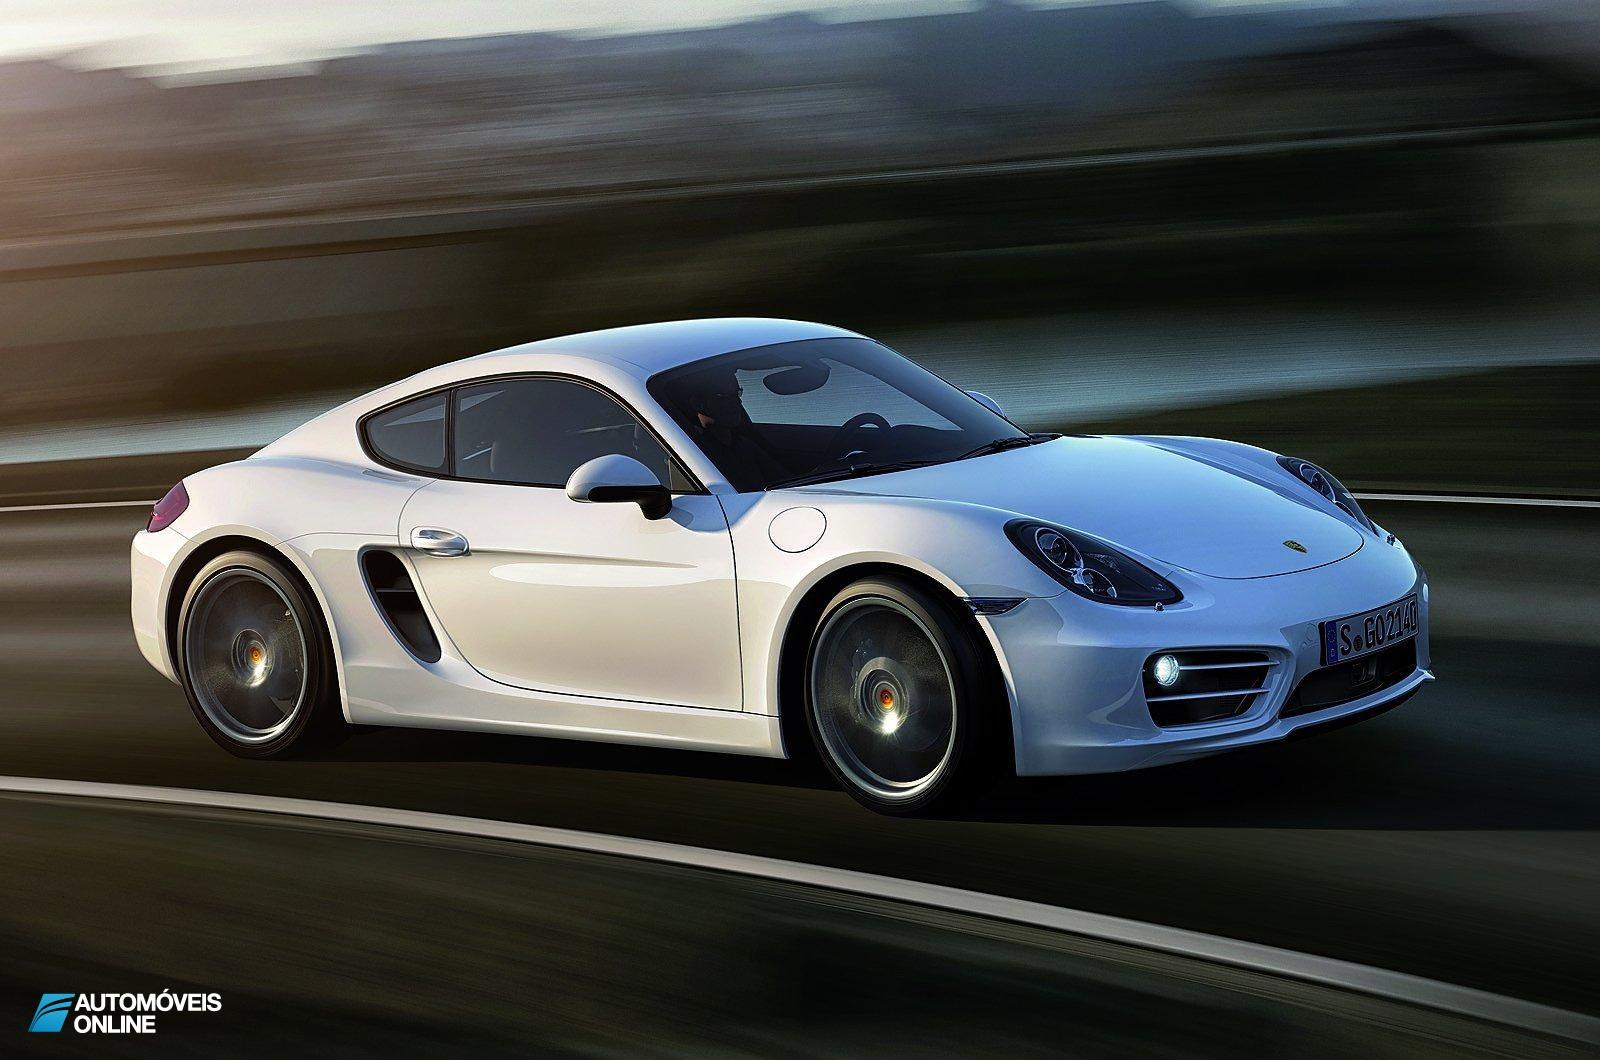 Novo Porsche Cayman 2013! Primeiras imagens